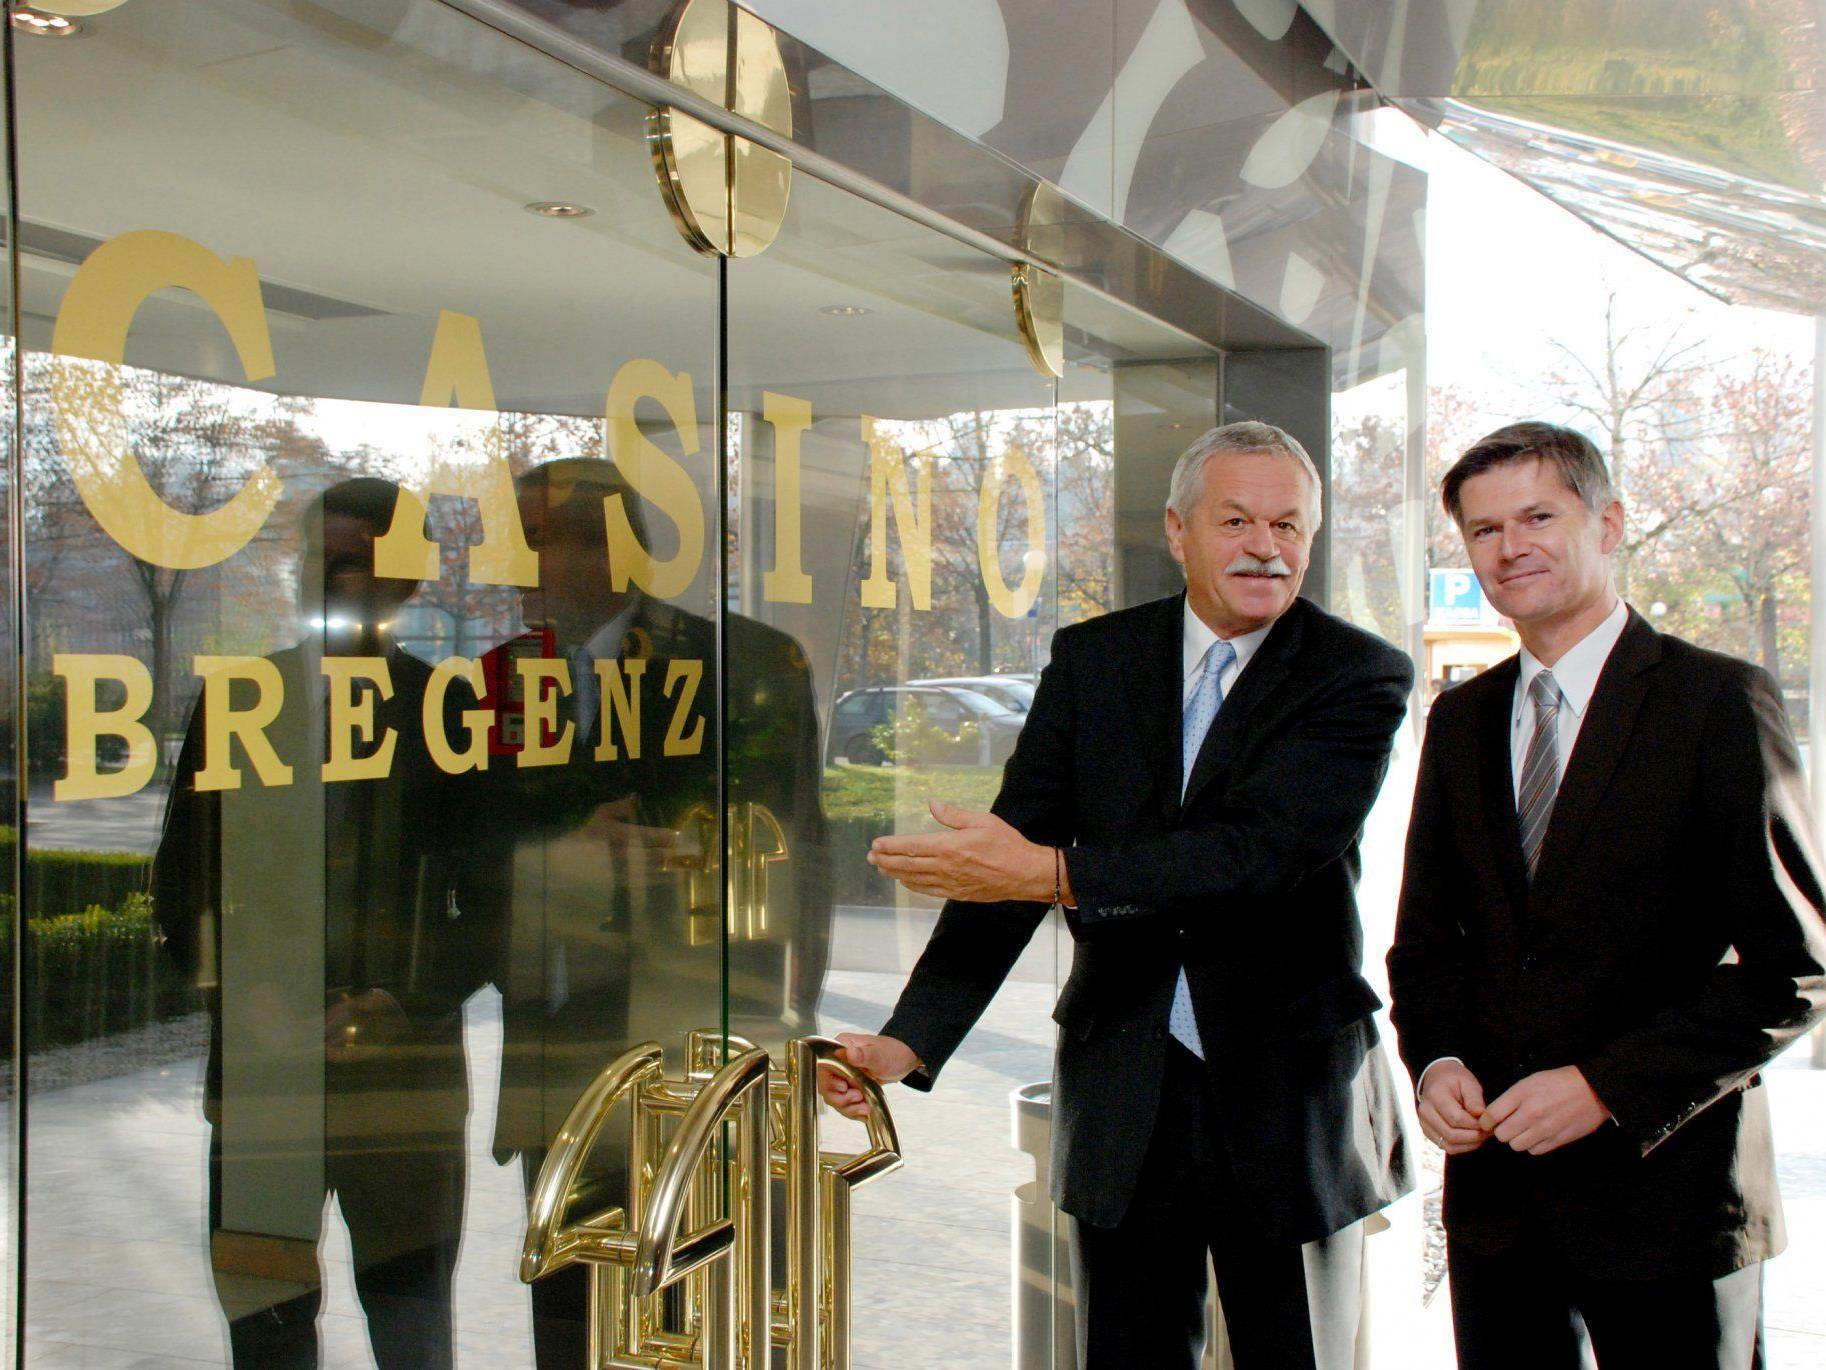 Casino-Direktor Josef Semler übergibt per 1.1.2012 die Geschäfte an seinen Nachfolger Bernhard Moosbrugger.